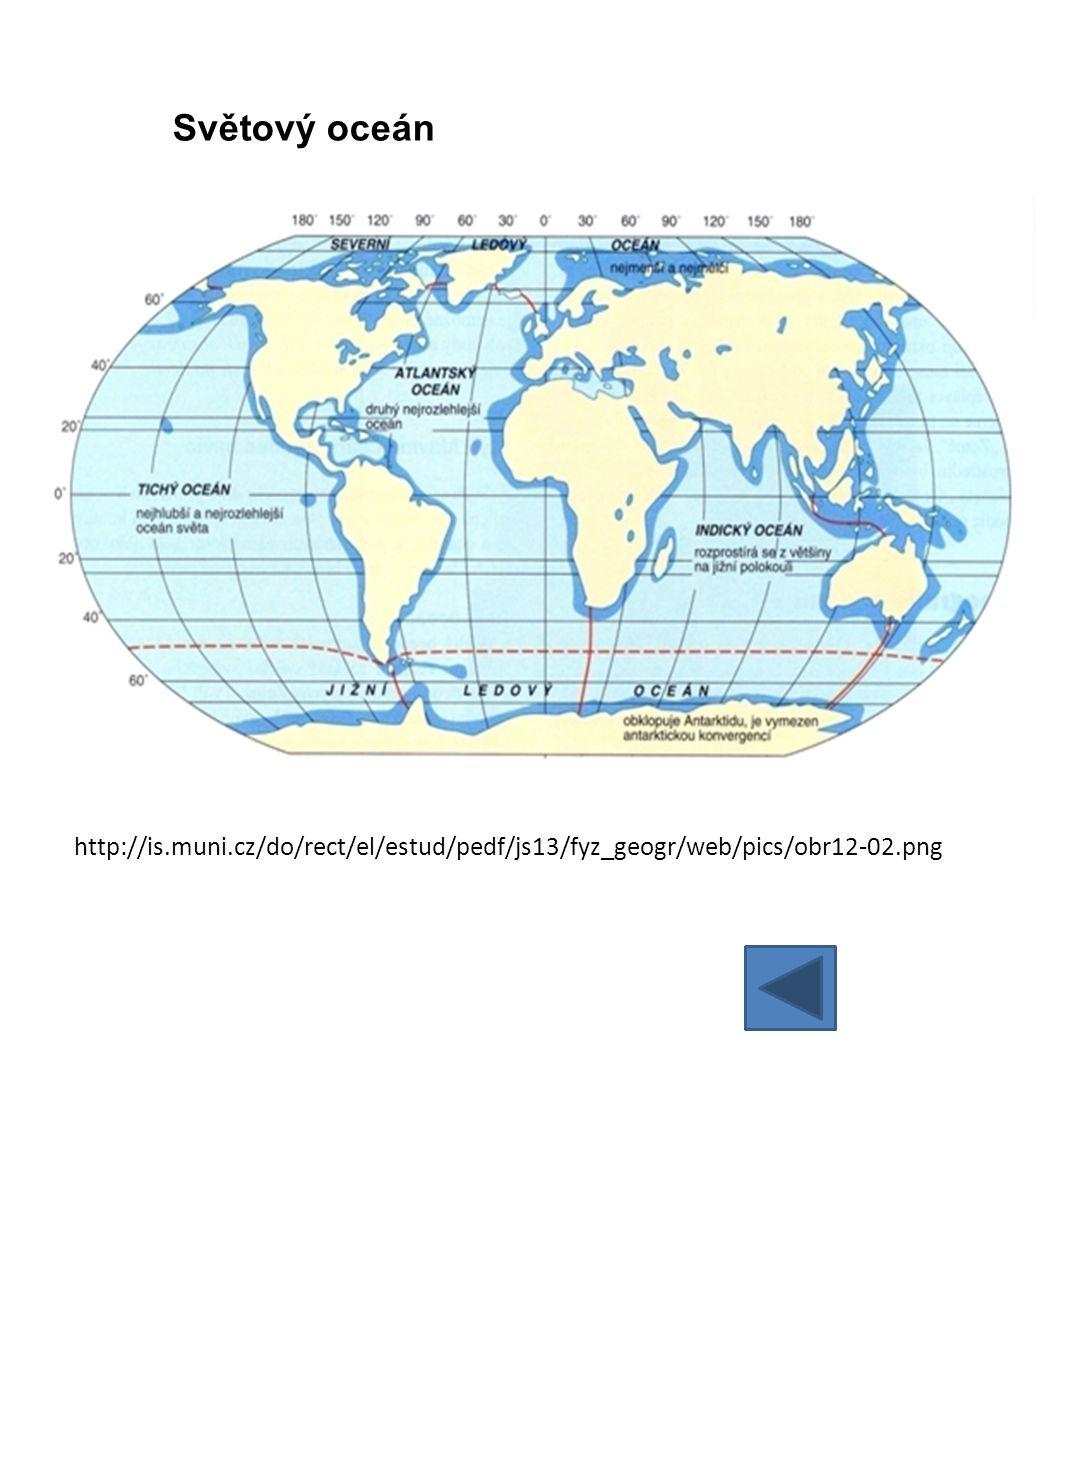 http://is.muni.cz/do/rect/el/estud/pedf/js13/fyz_geogr/web/pics/obr12-02.png Světový oceán